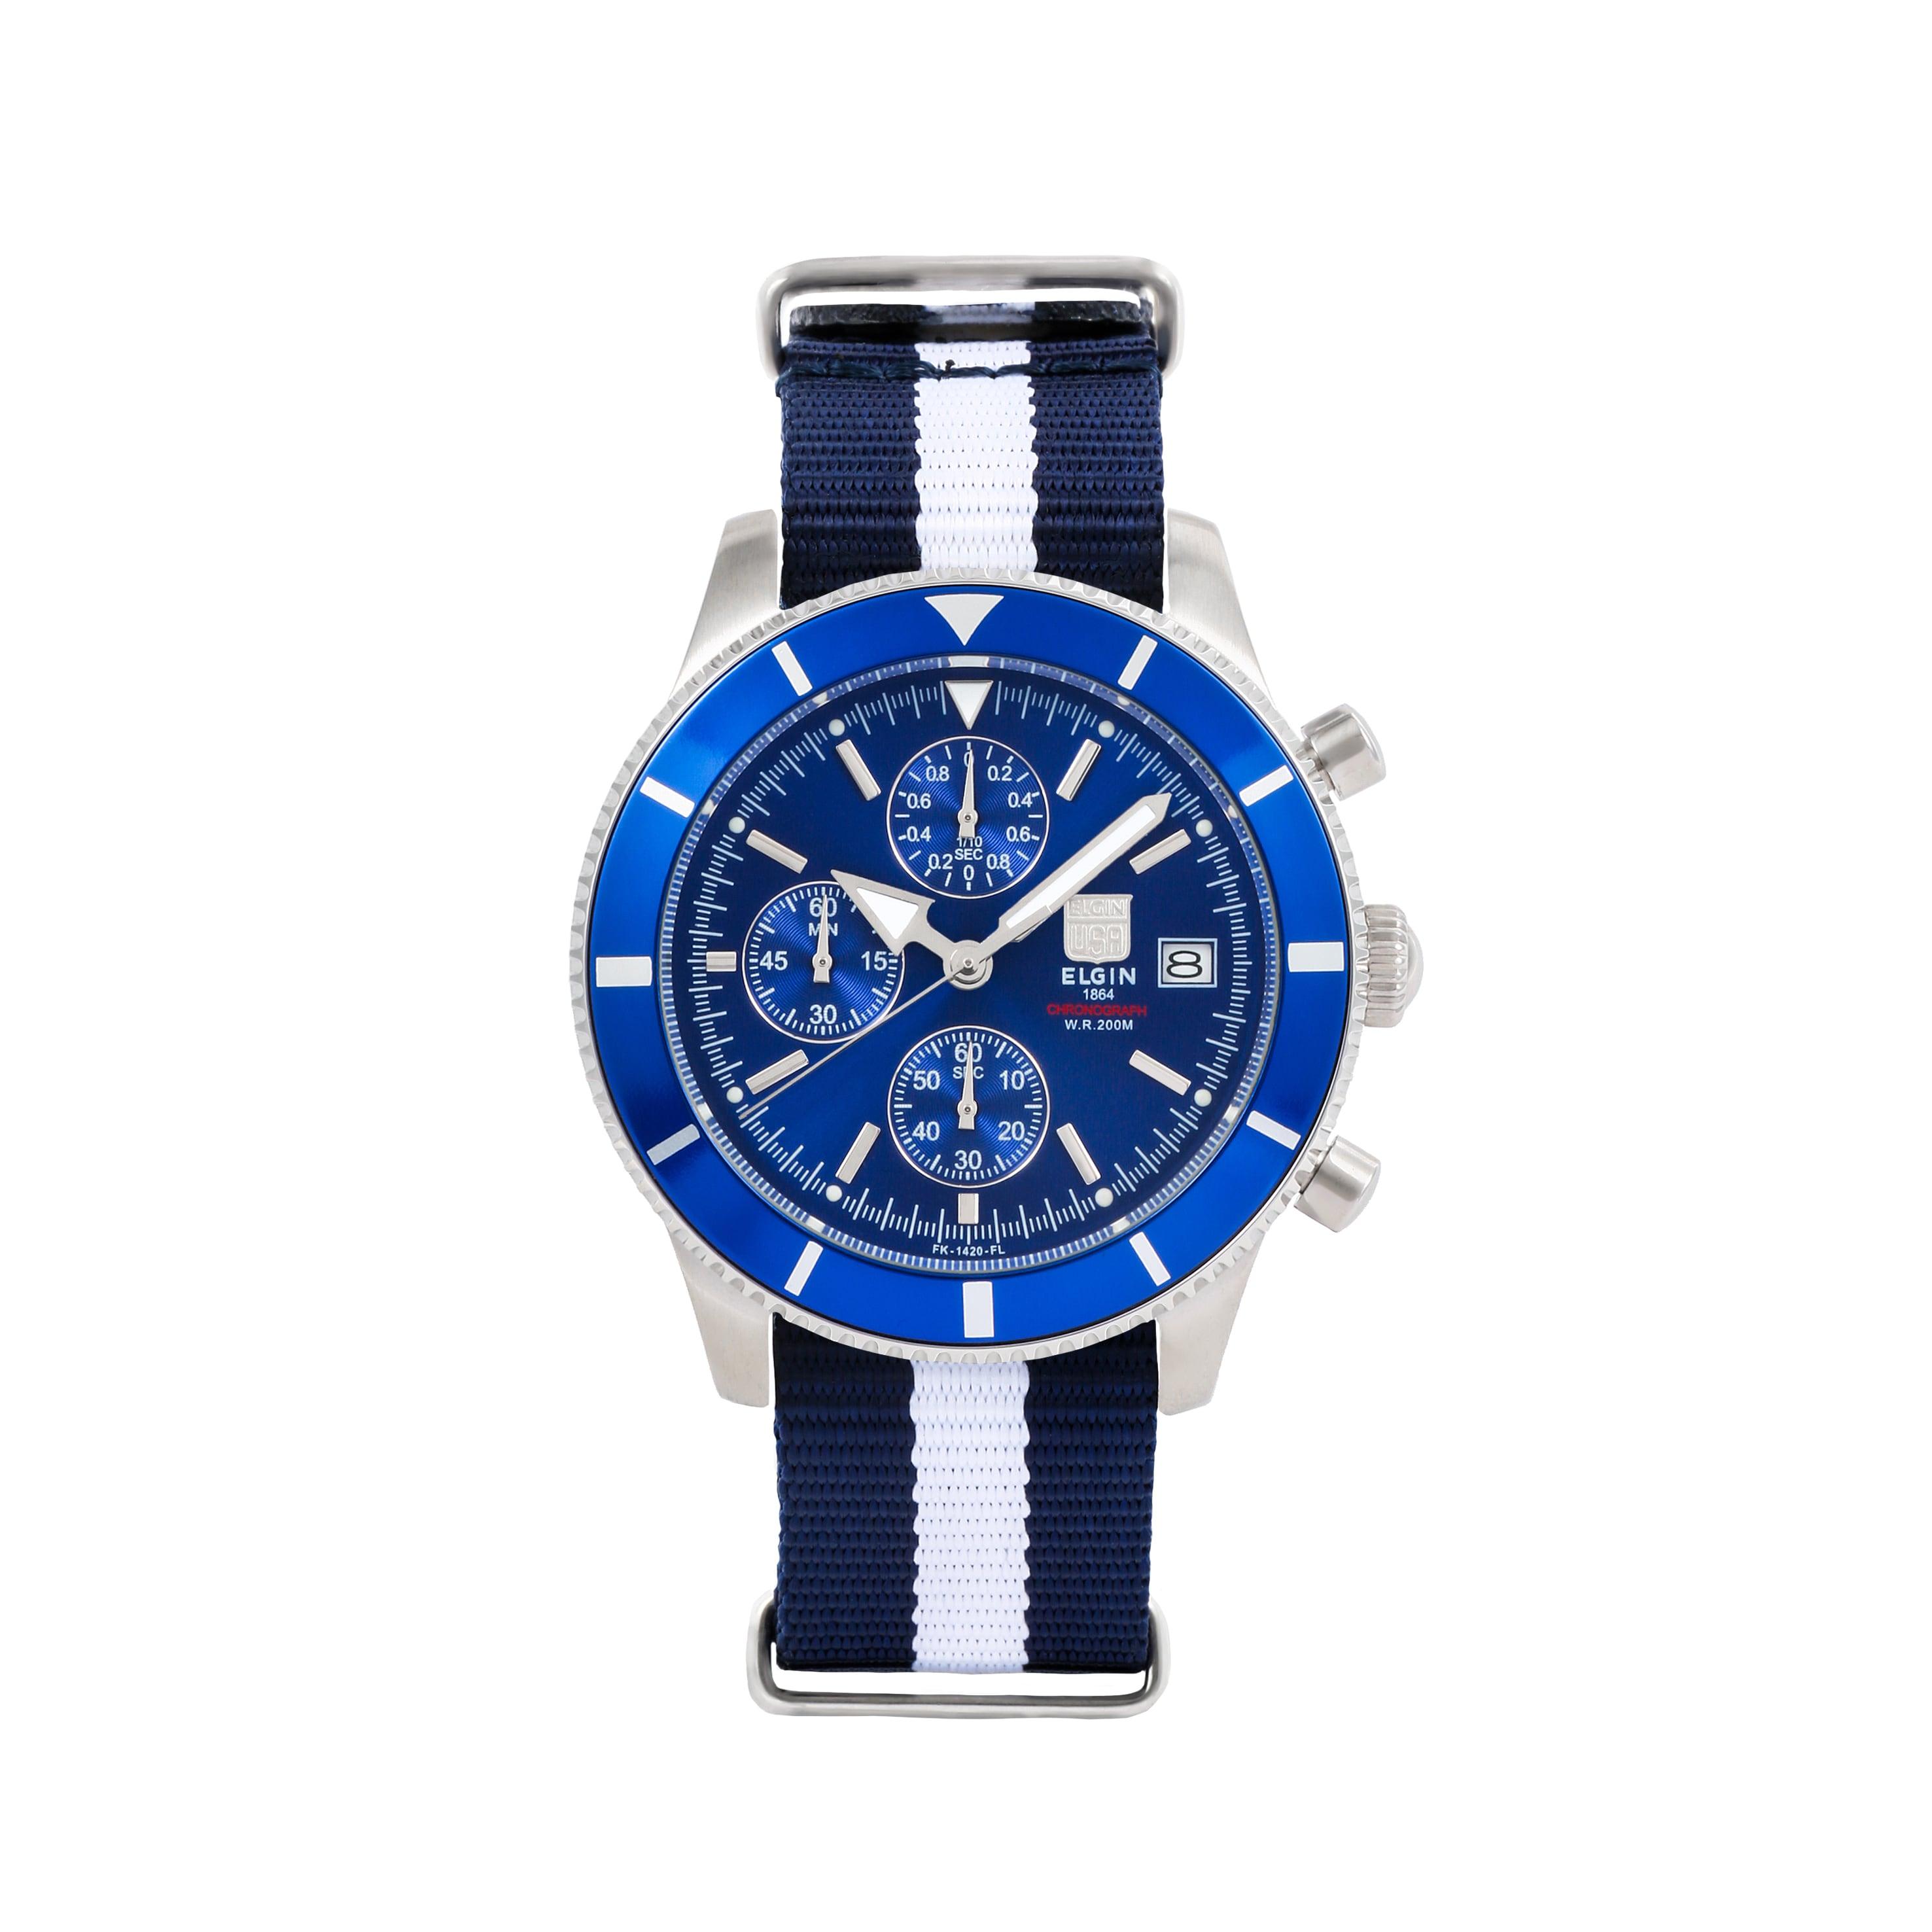 200M防水&機能的な腕時計 CC003